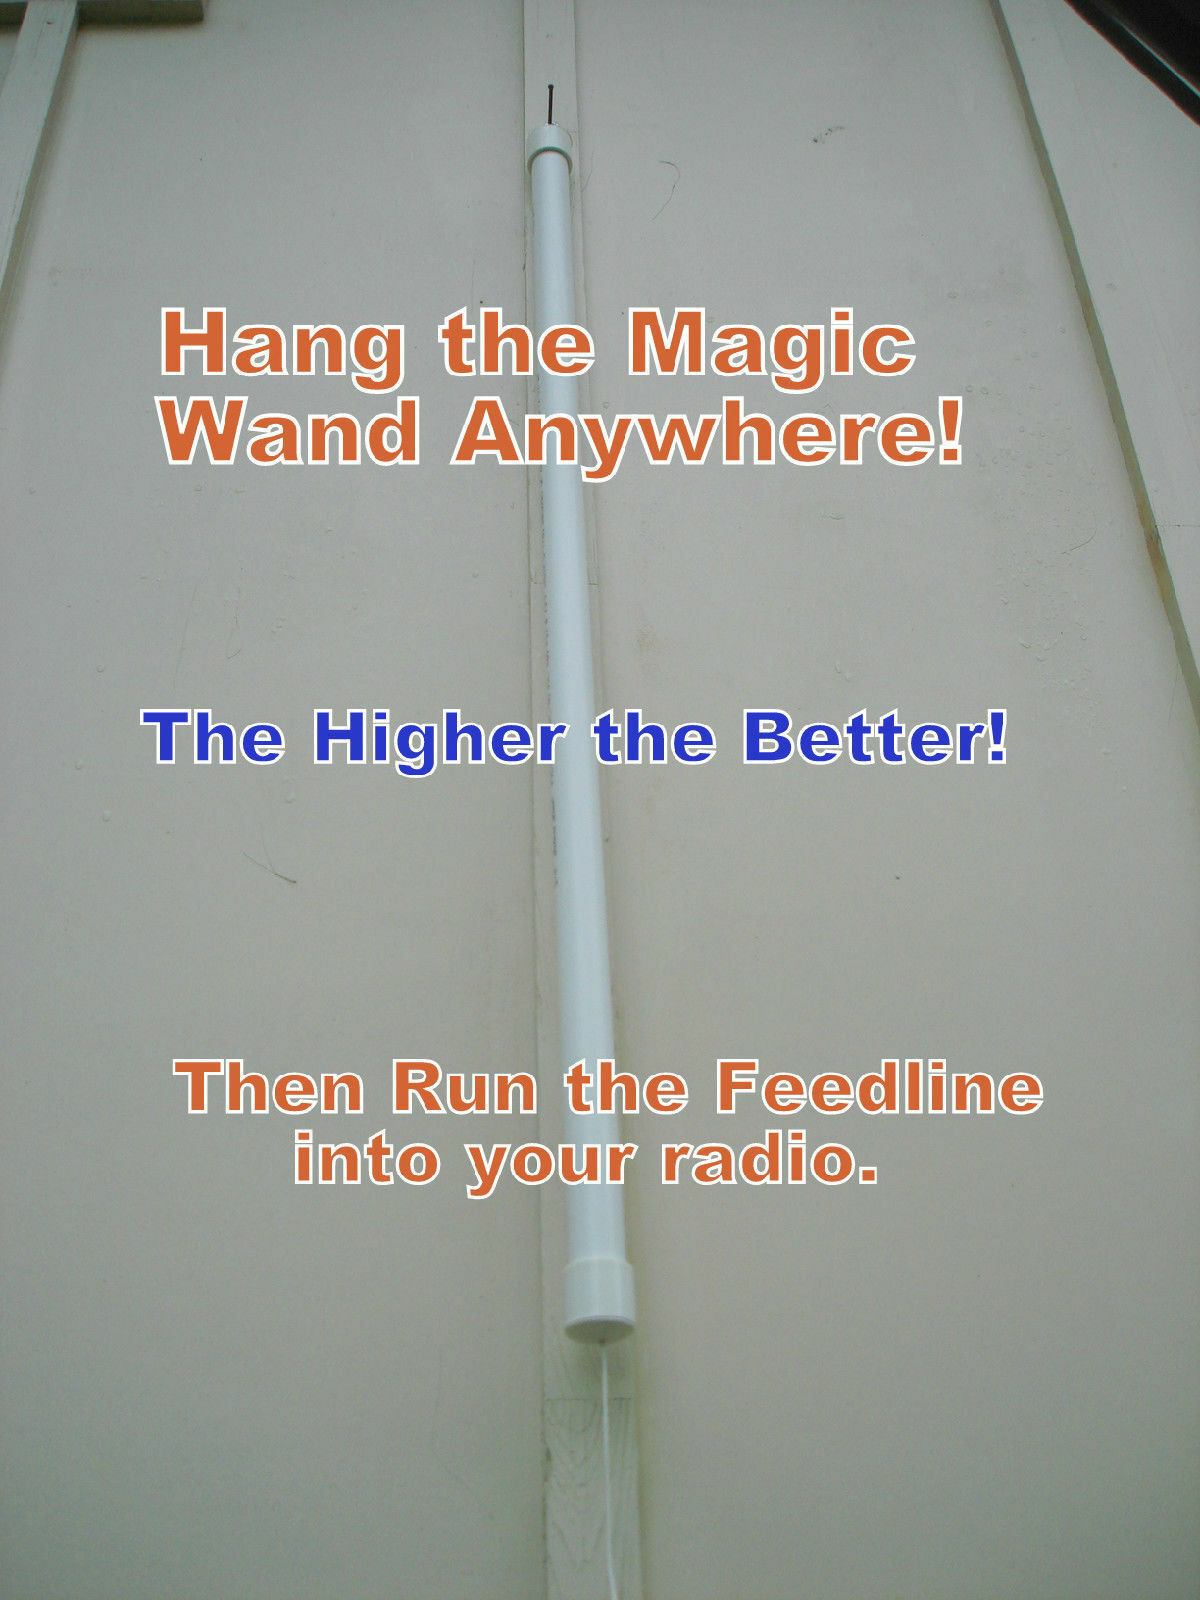 Lowbander's Antenna Mart